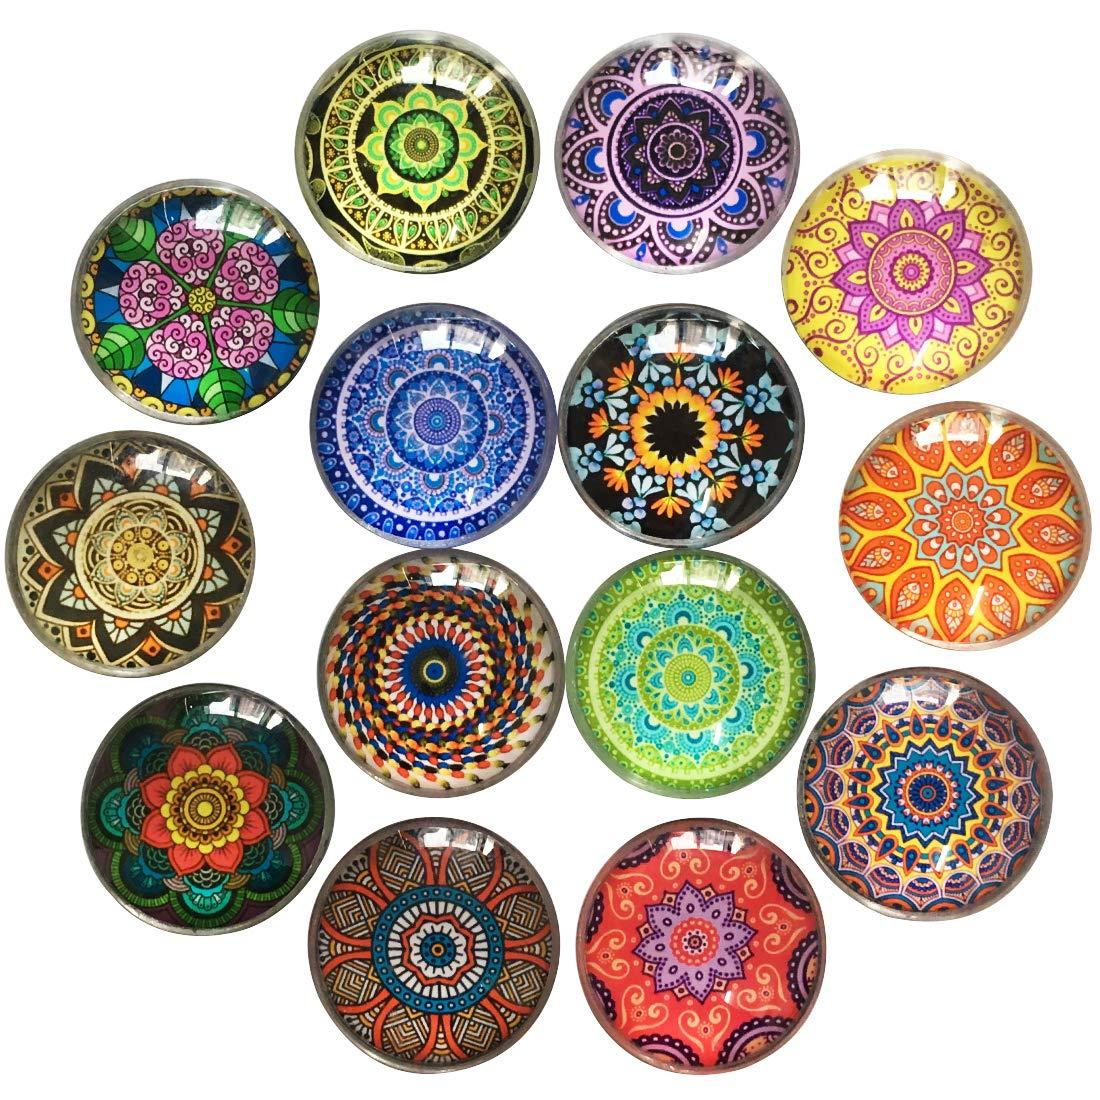 DIYSELF 14Pack Glass Fridge Magnets Refrigerator Magnets Office Magnets Small Magnets Colorful Decoration Magnets for Whiteboard